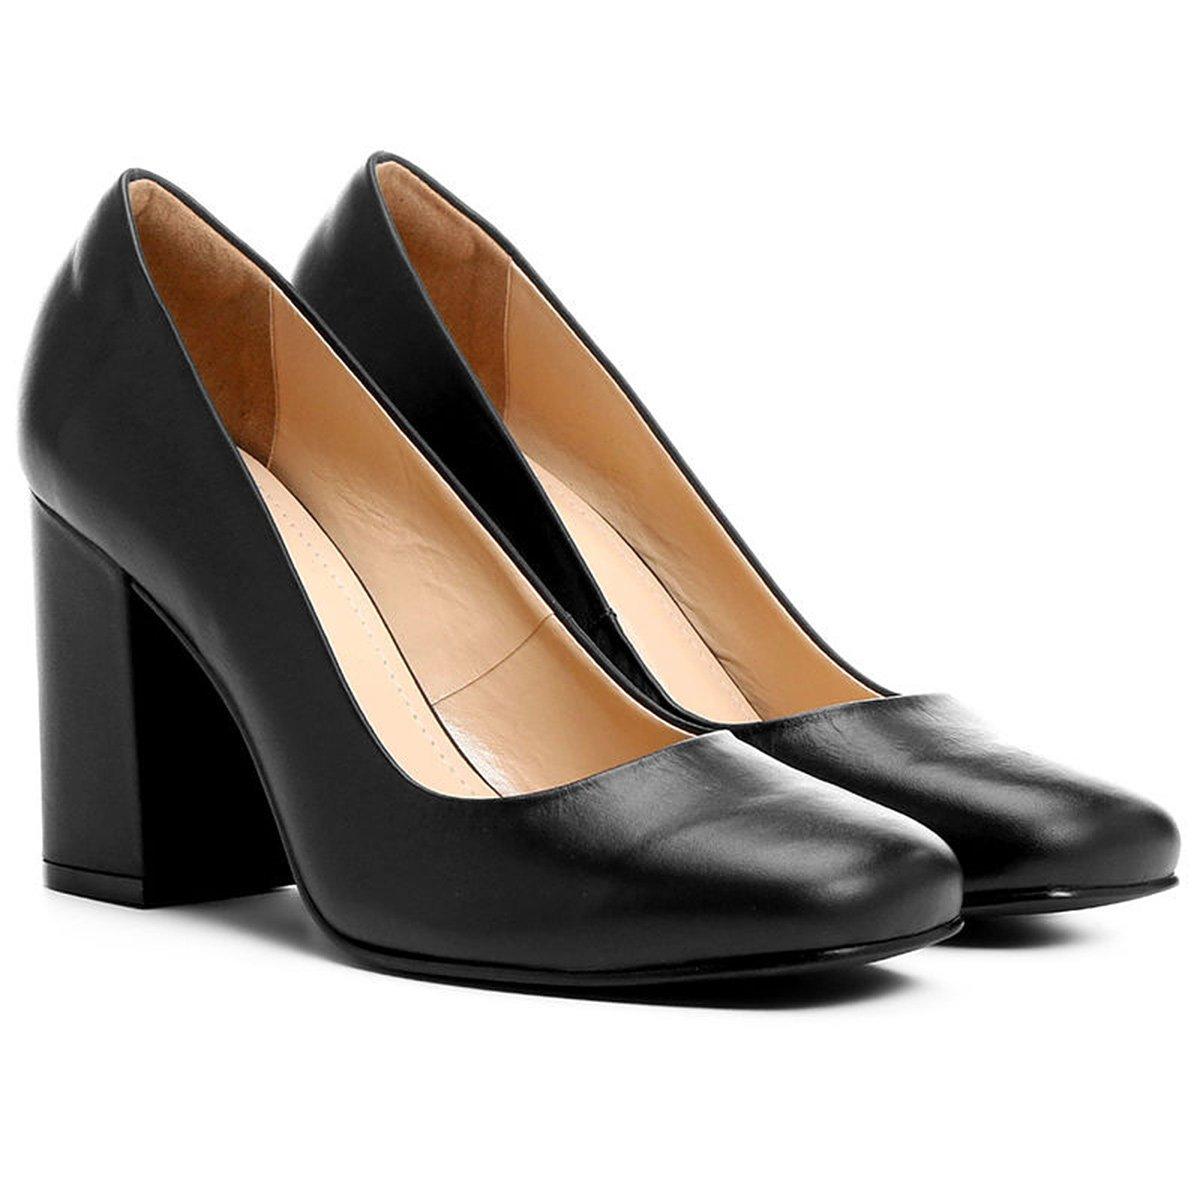 801003d8c4 Scarpin Couro Shoestock Salto Alto Grosso